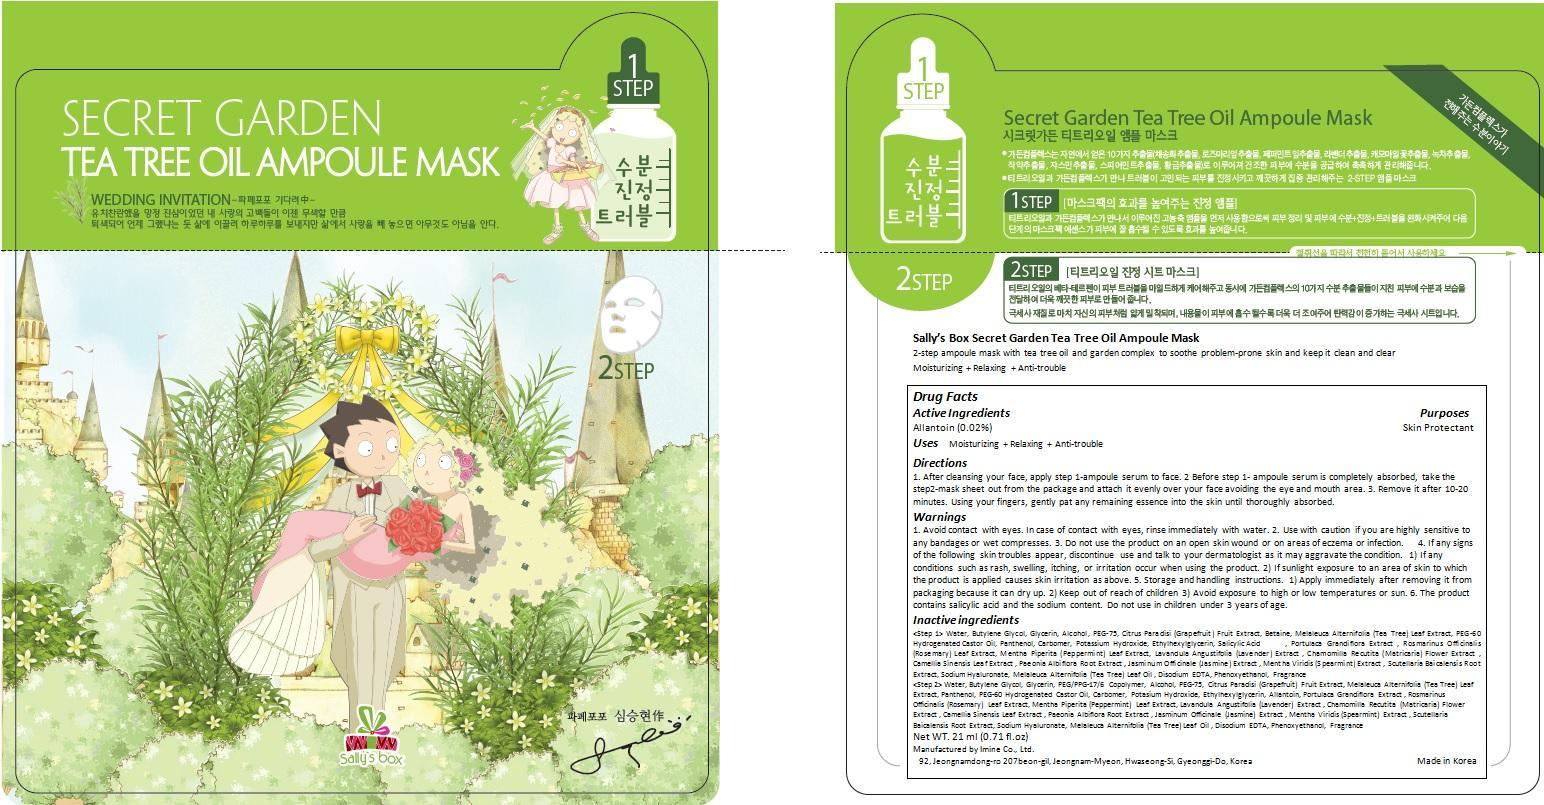 Sallys Box Secret Garden Tea Tree Oil Ampoule Mask | Allantoin Cream Breastfeeding